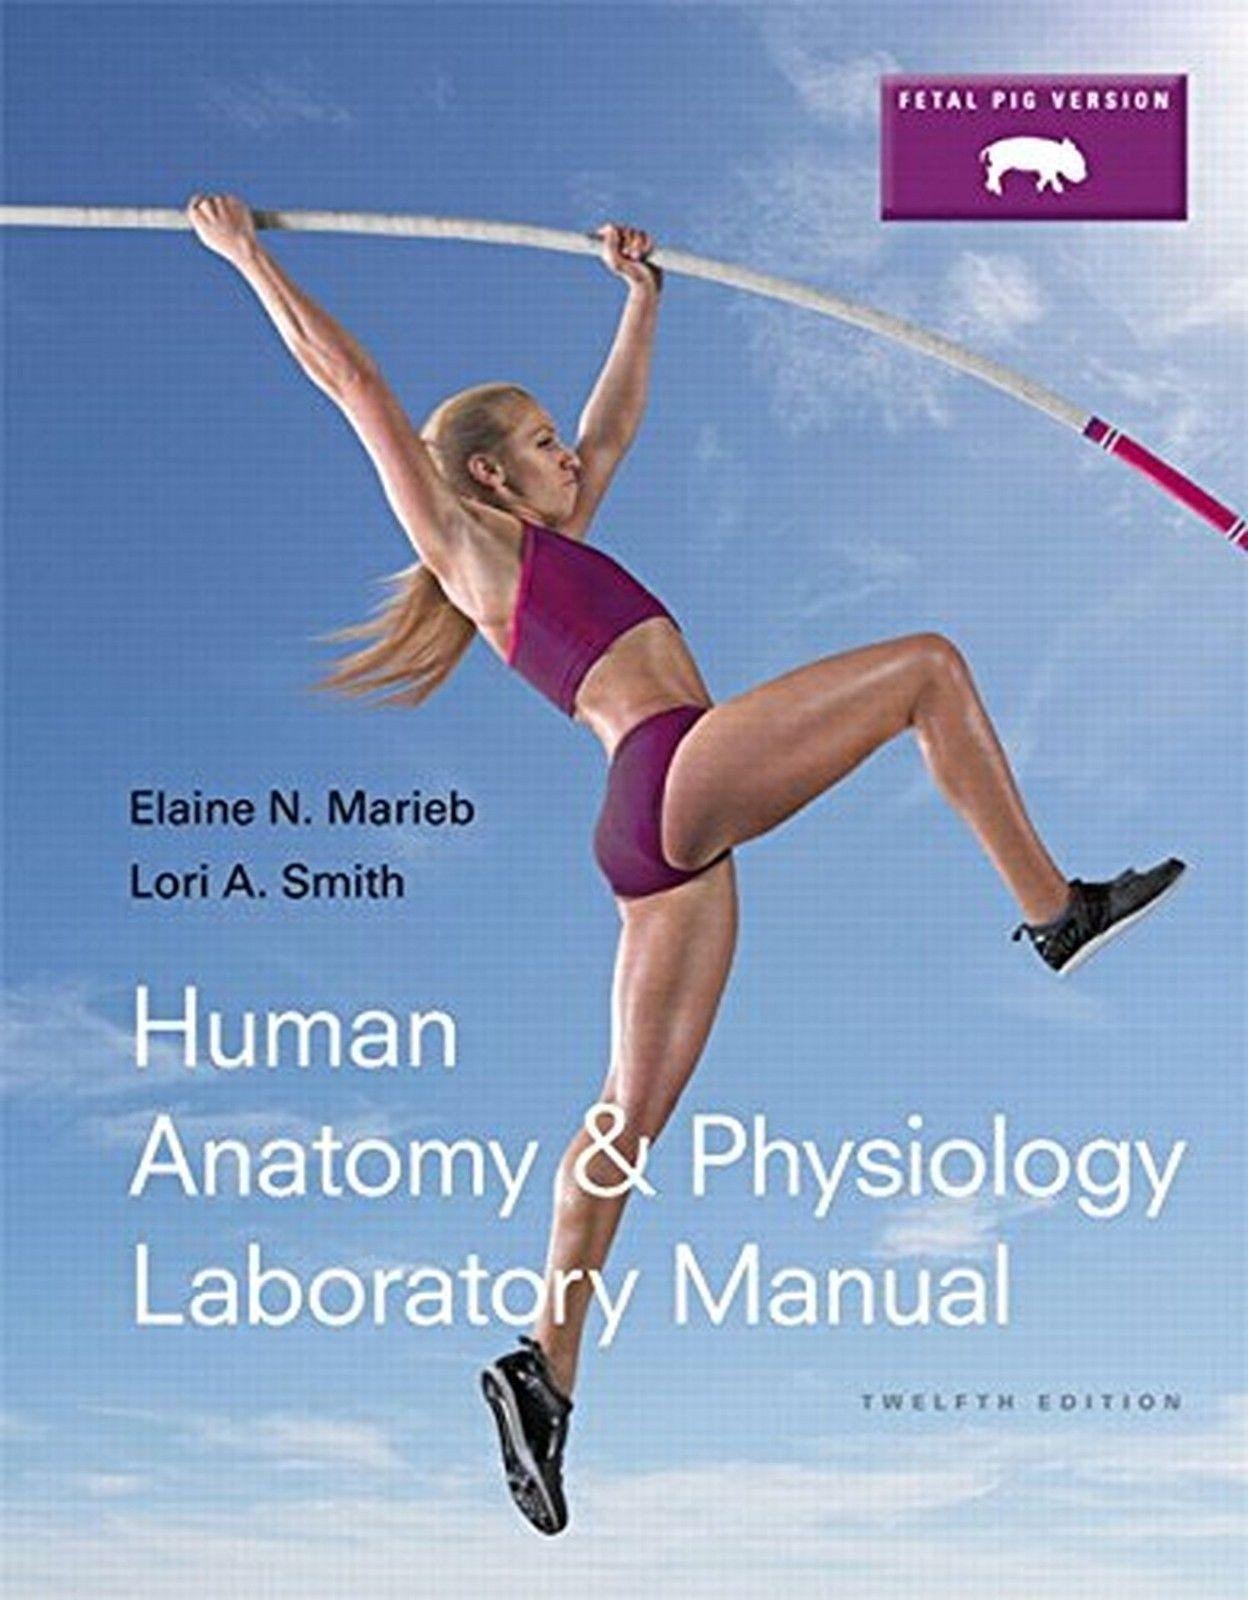 Human Anatomy & Physiology Laboratory Manual Fetal Pig Version (12Th Edition ).